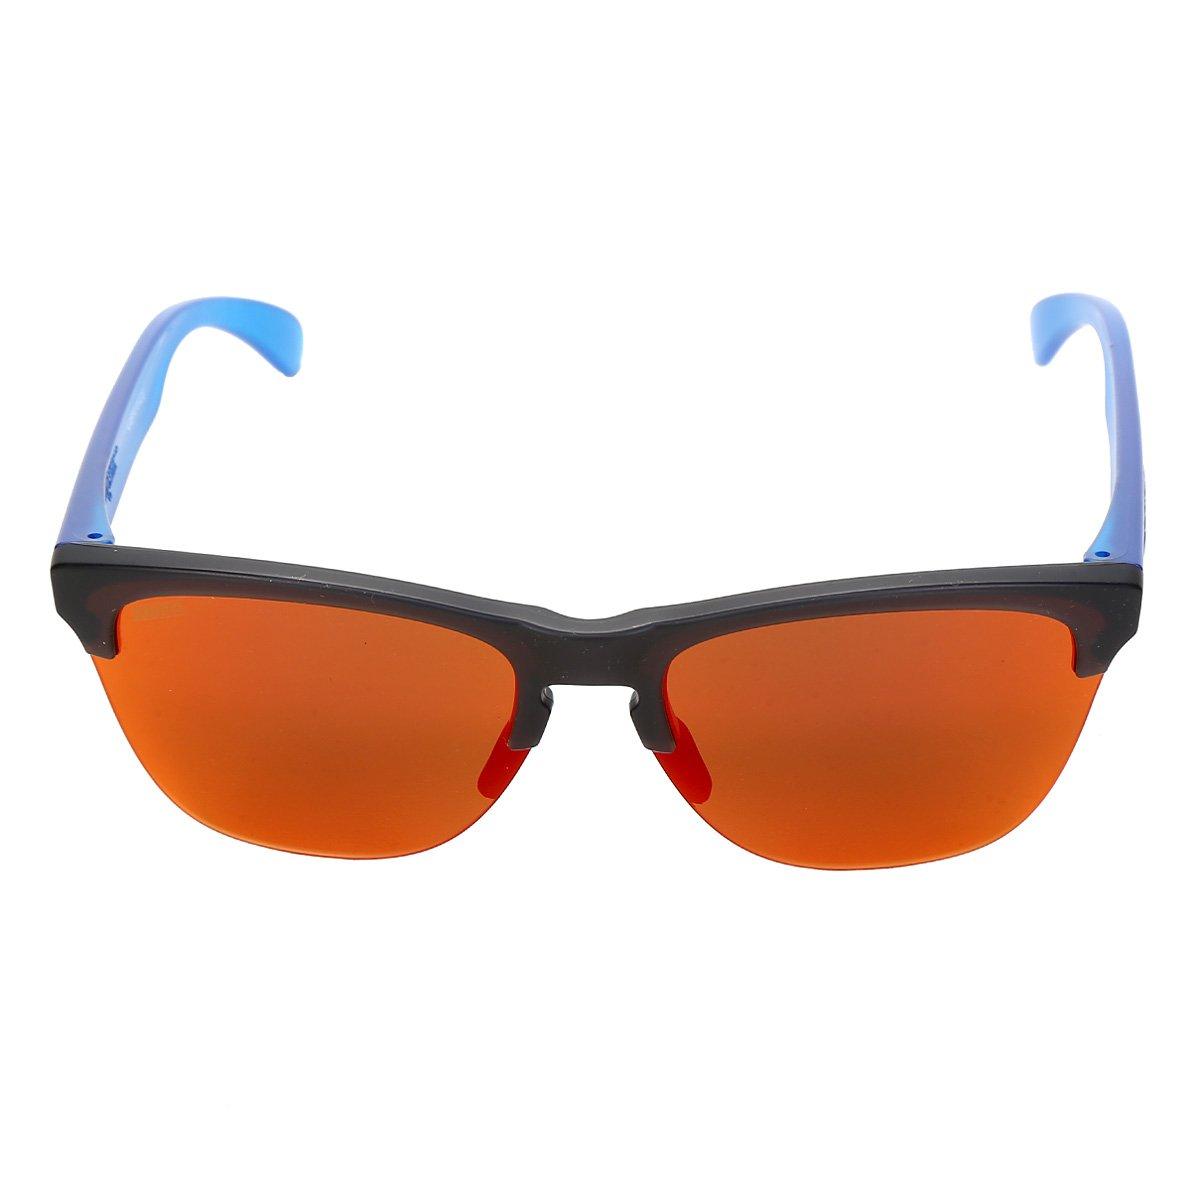 Óculos Oakley Frogskins Lite - 1